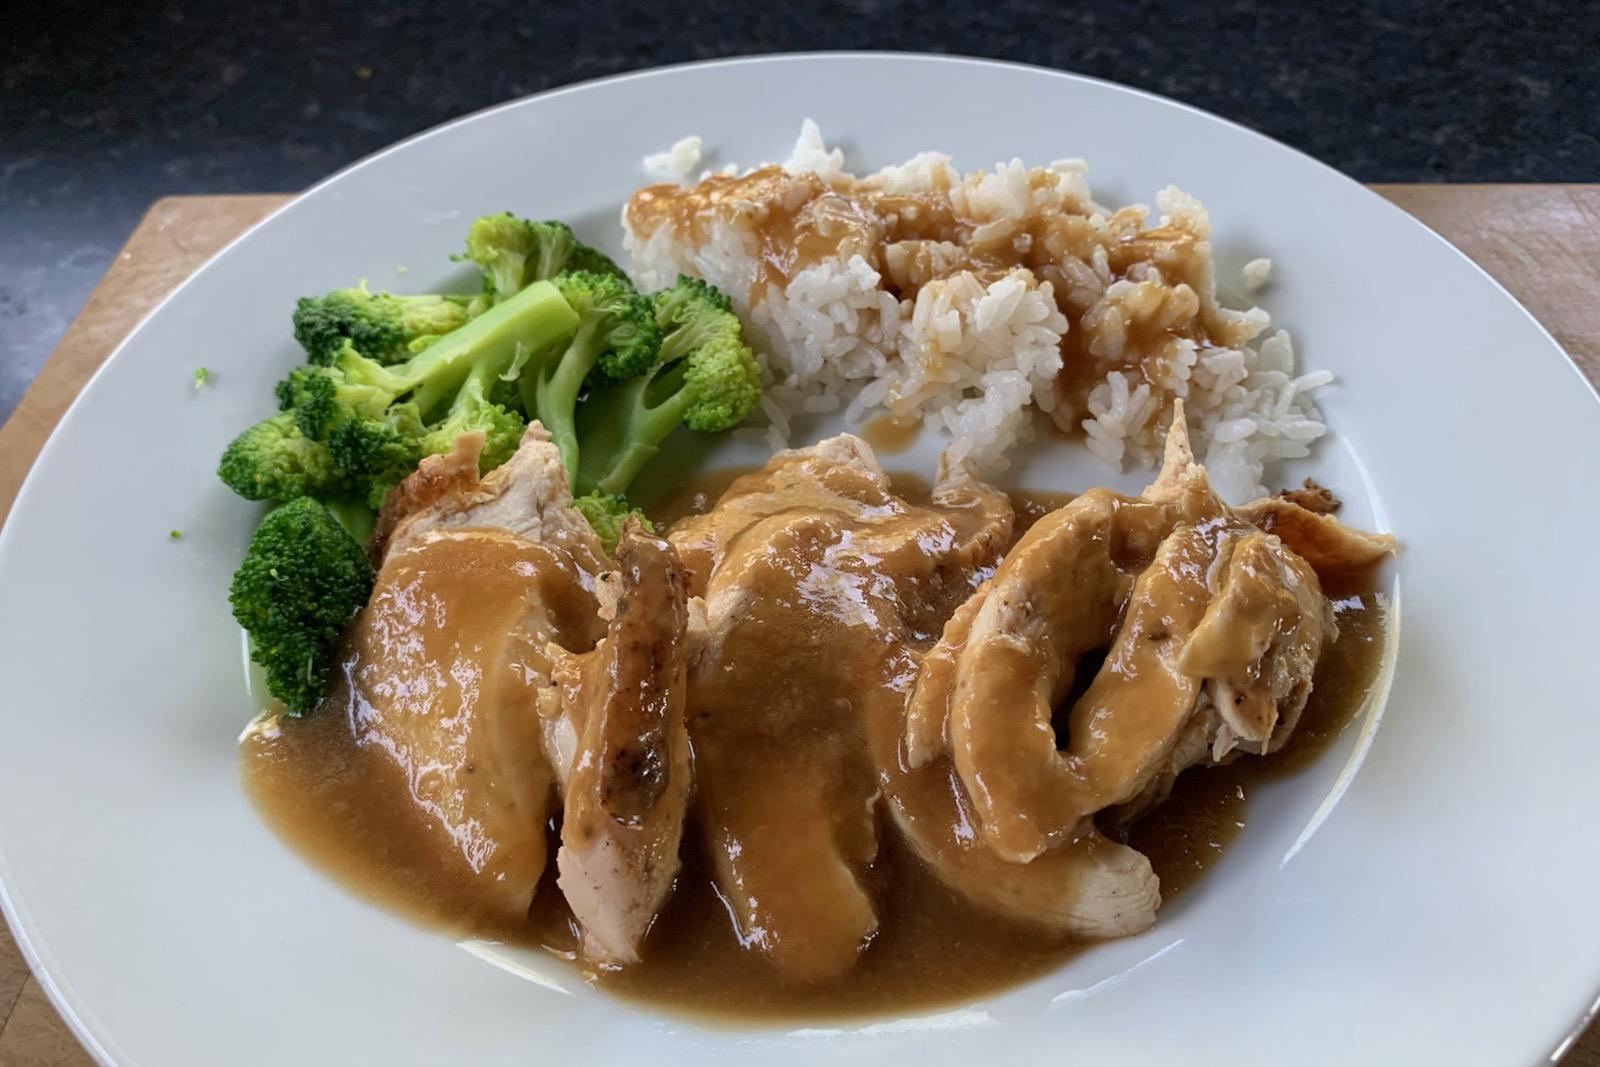 http://blog.rickk.com/food/2020/09/08/ate.2020.09.08.d.jpg